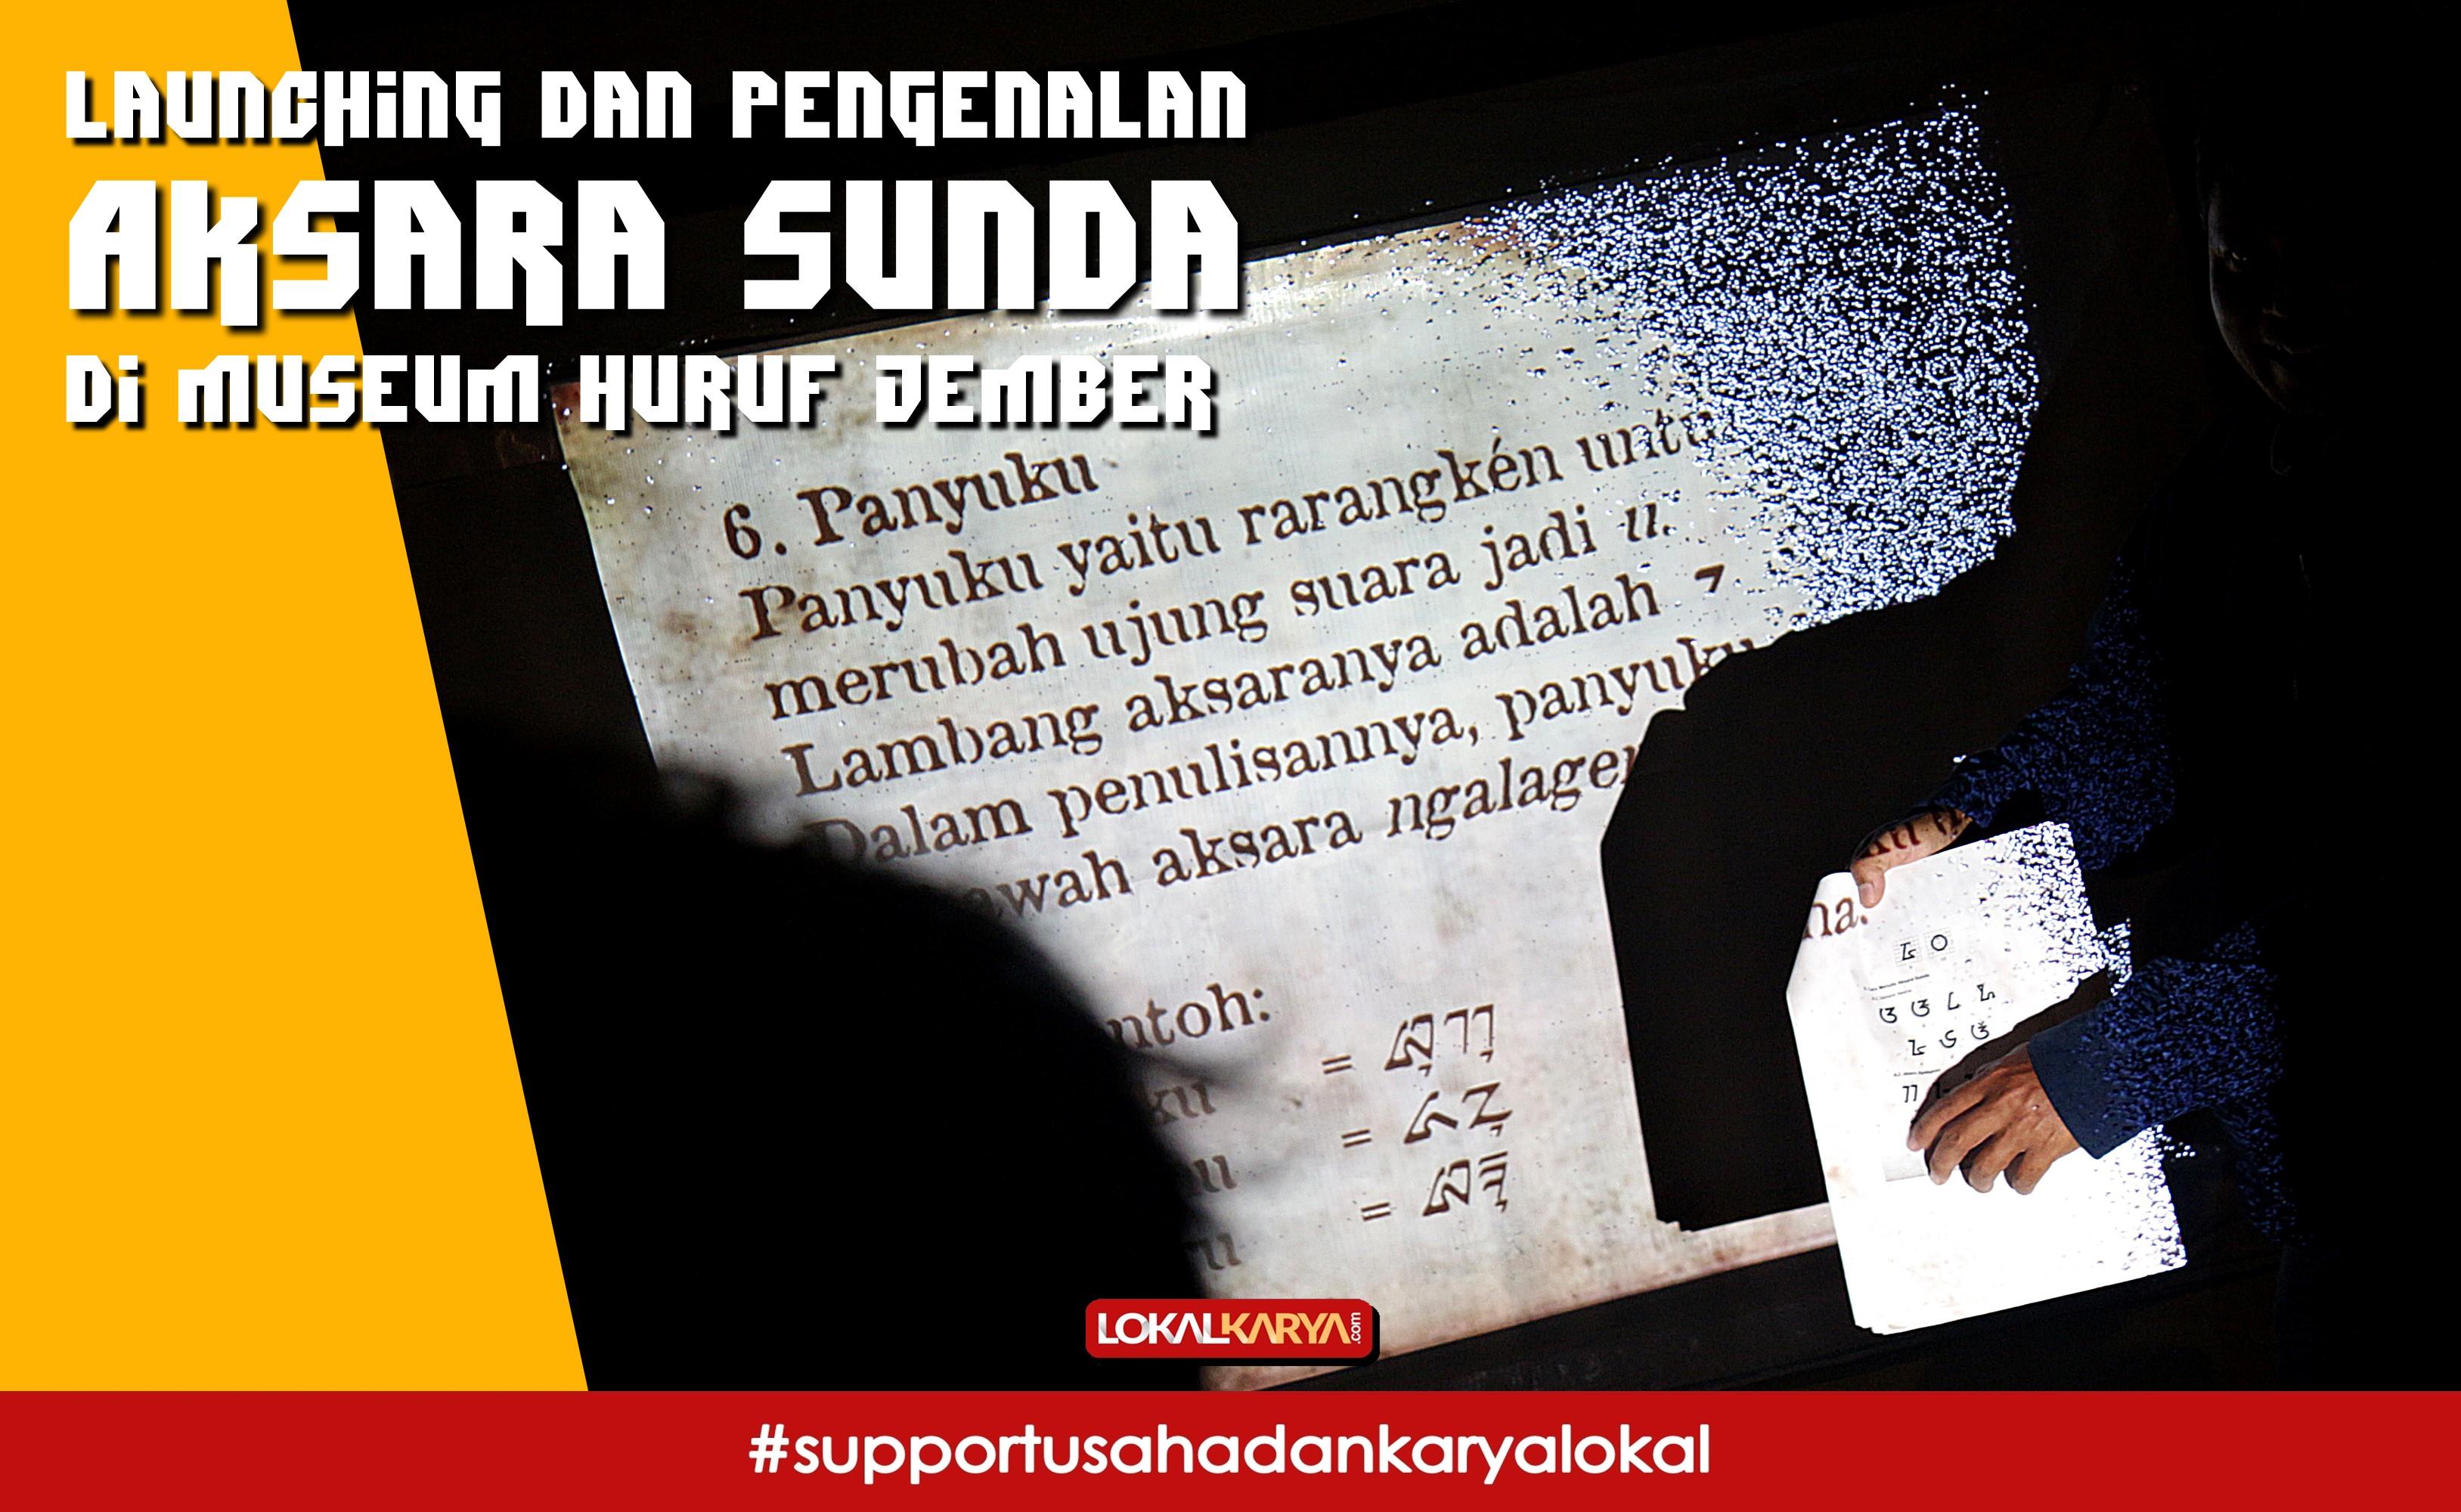 Aksara Sunda Diluncurkan Museum Huruf Lokal Karya Launching Pengenalan Jember